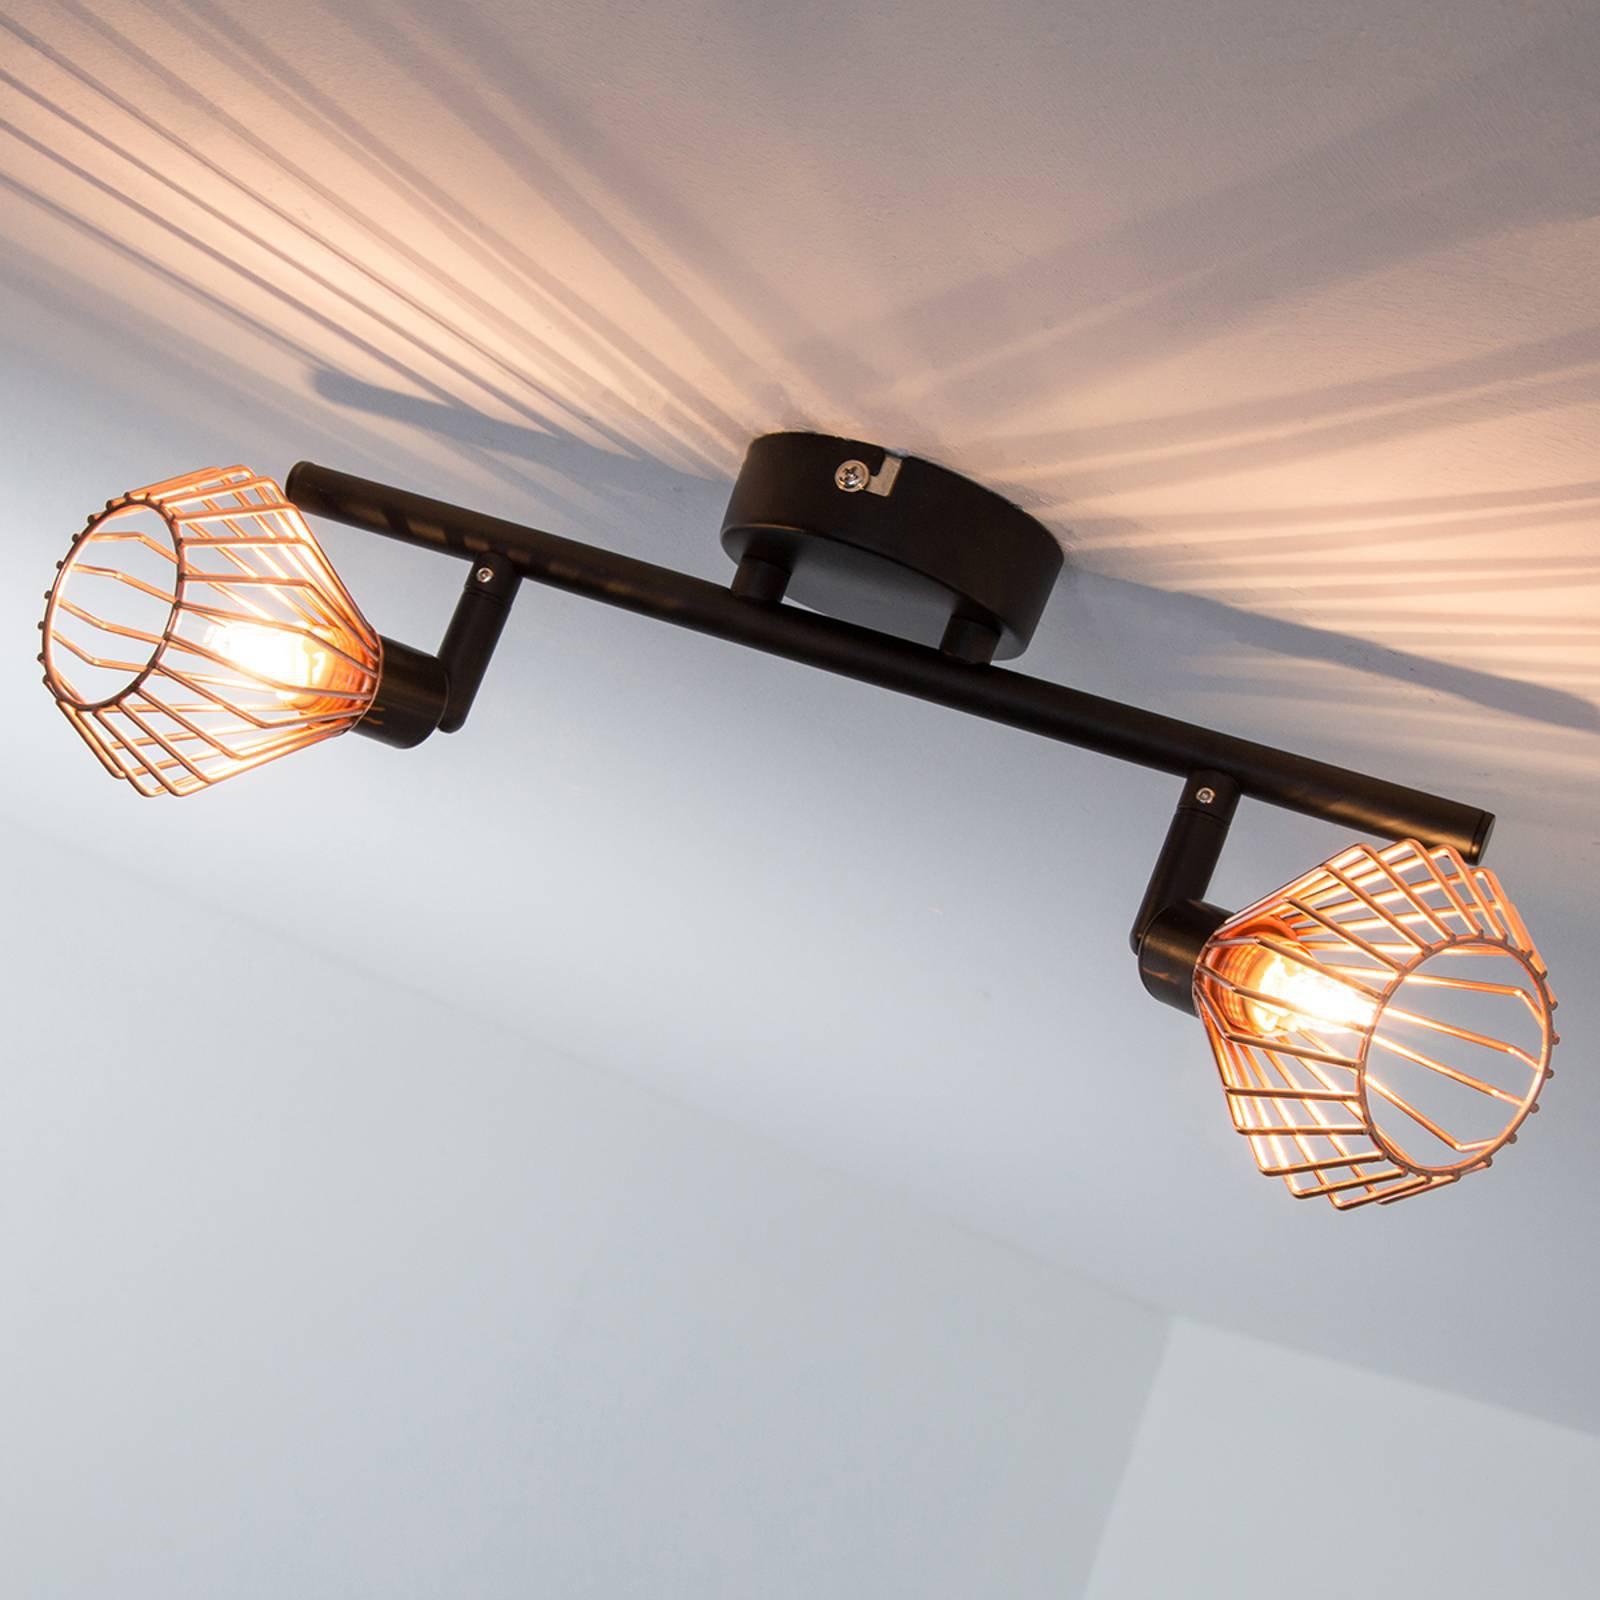 Kobber-svart taklampe Dalma - 2 lyskilder